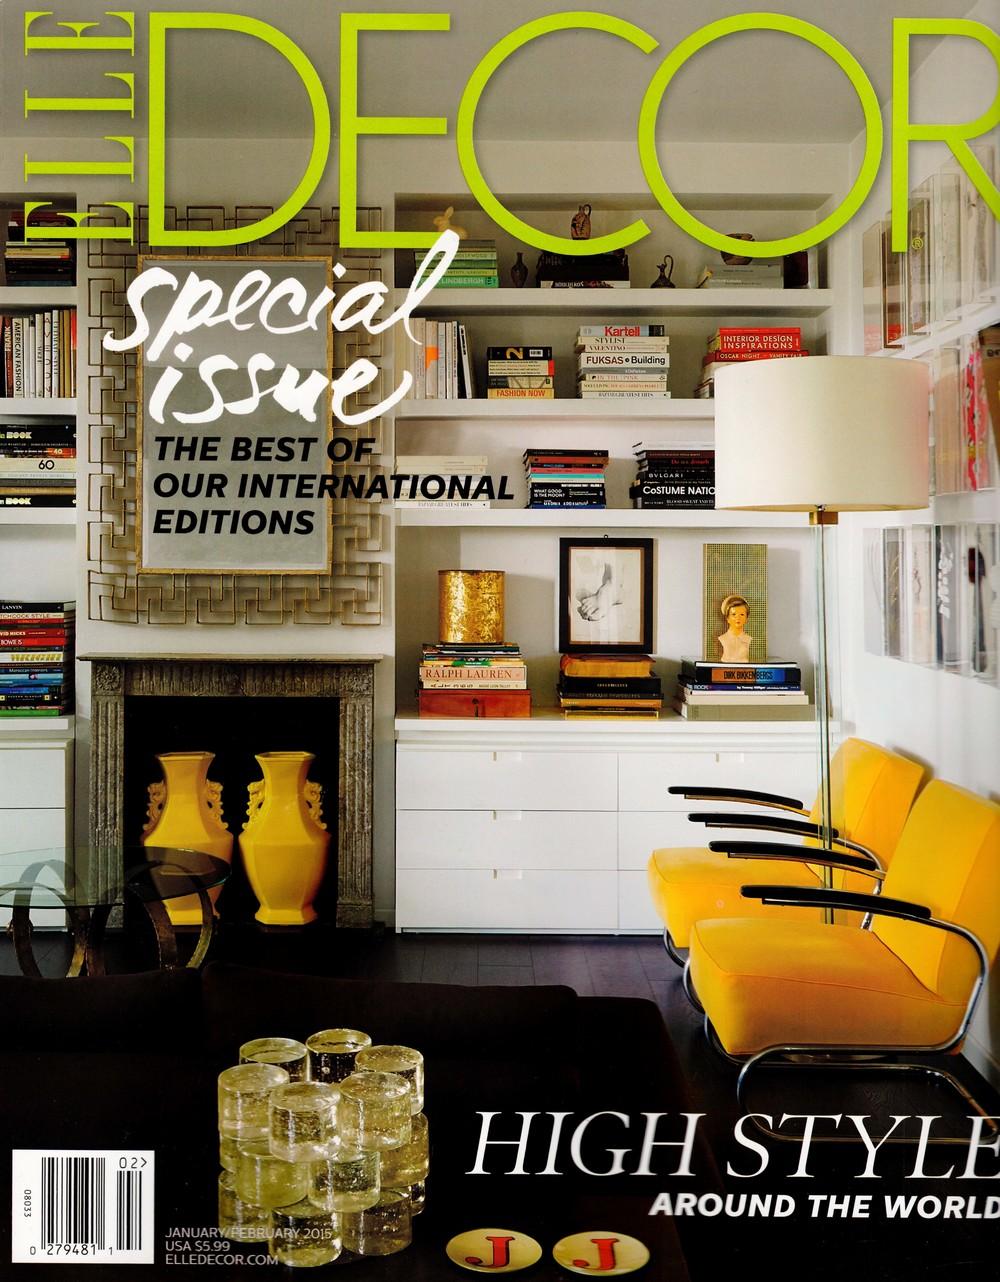 ED Jan 2015 Cover SMALL.jpg